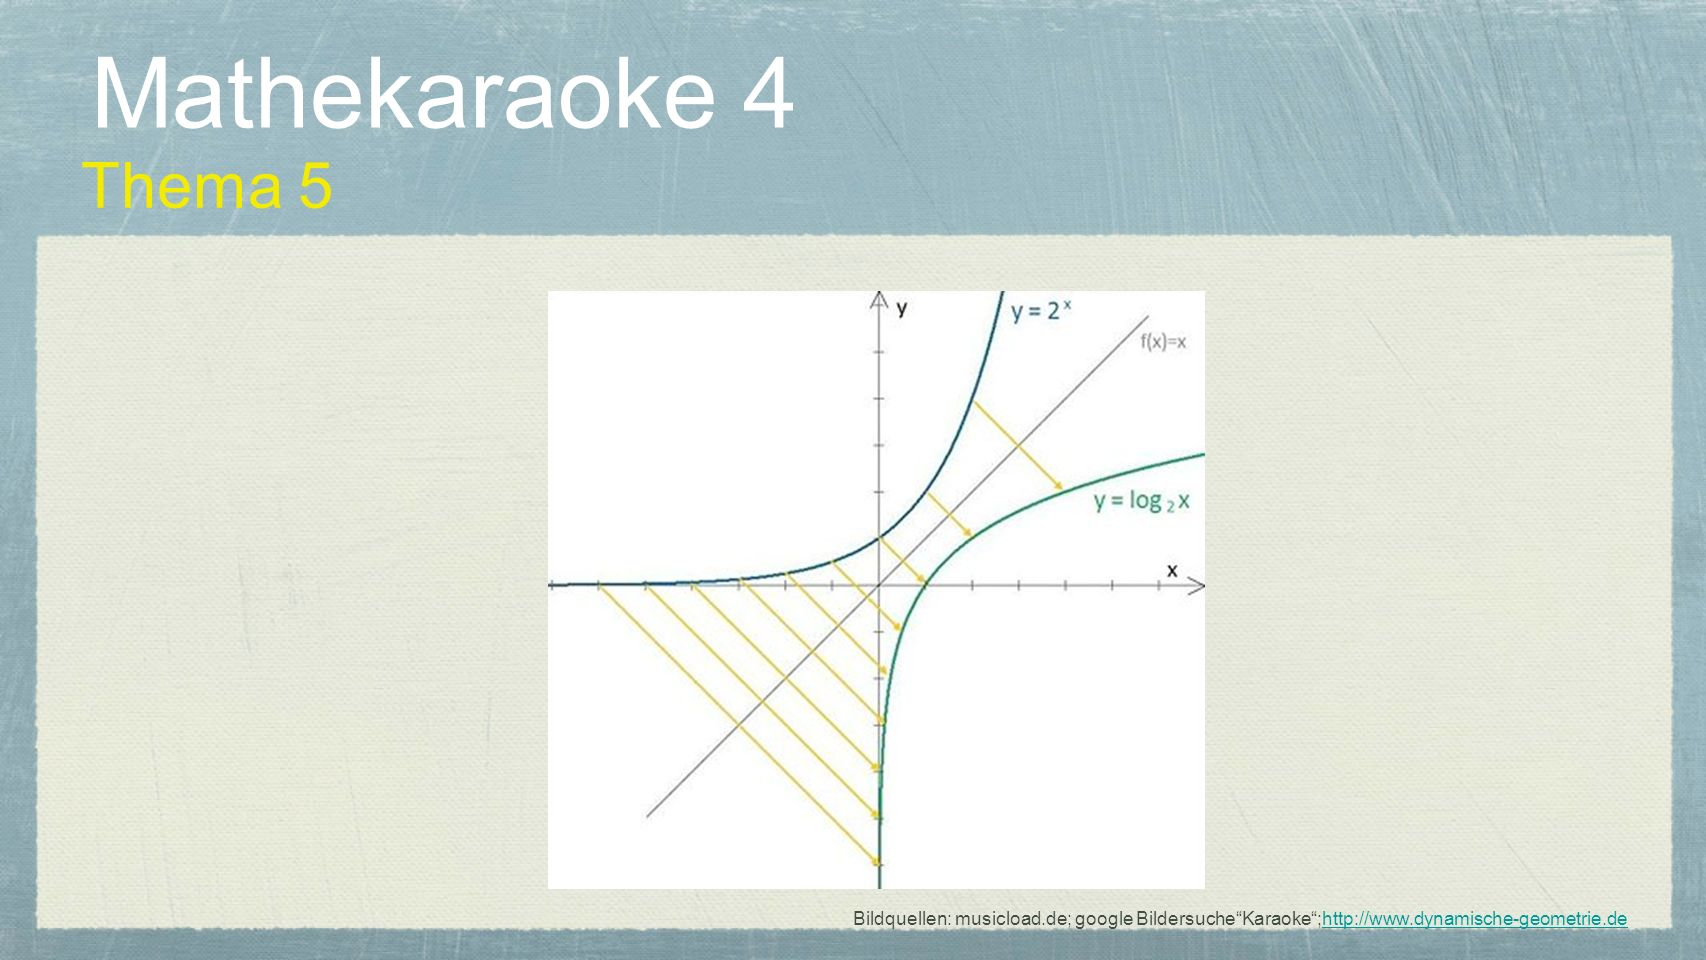 Mathekaraoke 4 Thema 5 Bildquellen: musicload.de; google BildersucheKaraoke;http://www.dynamische-geometrie.dehttp://www.dynamische-geometrie.de